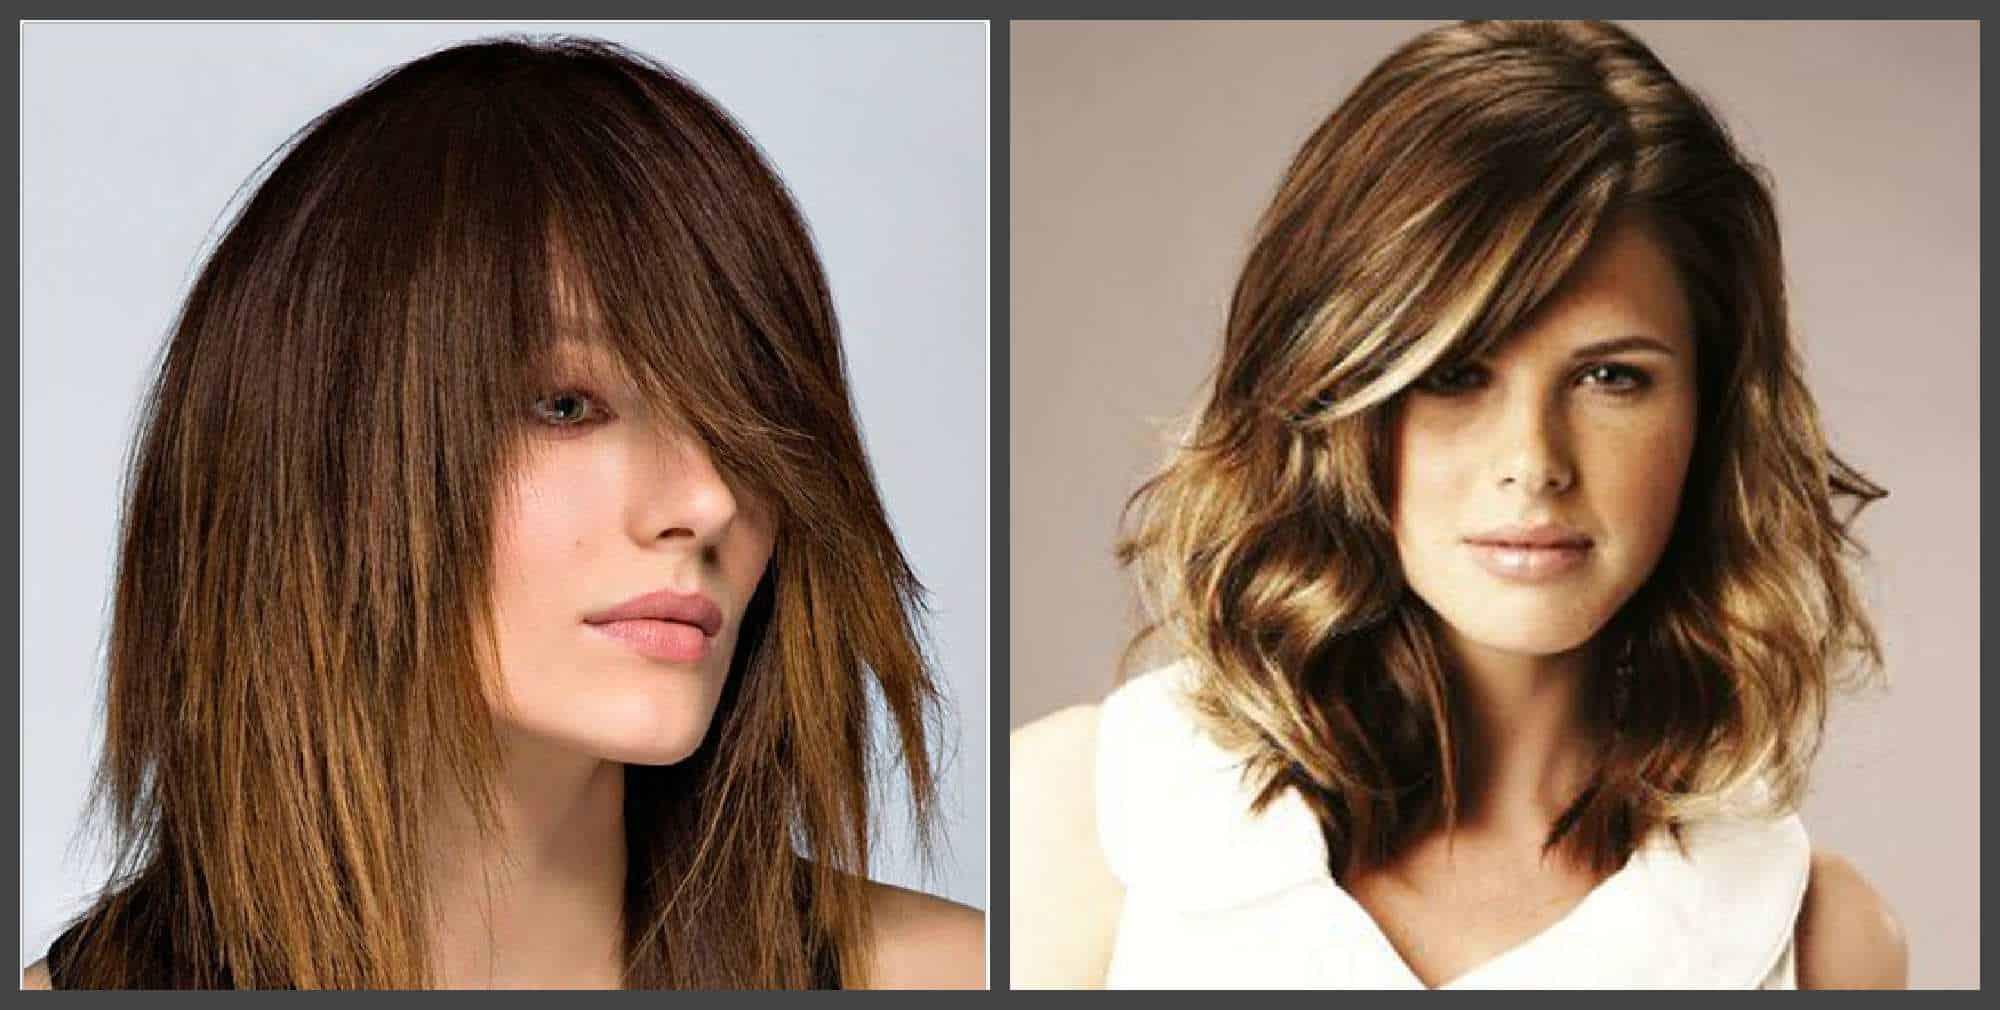 Cortes pelo mujer peinados moda pequenita cortes de pelo - Cortes de peinado ...